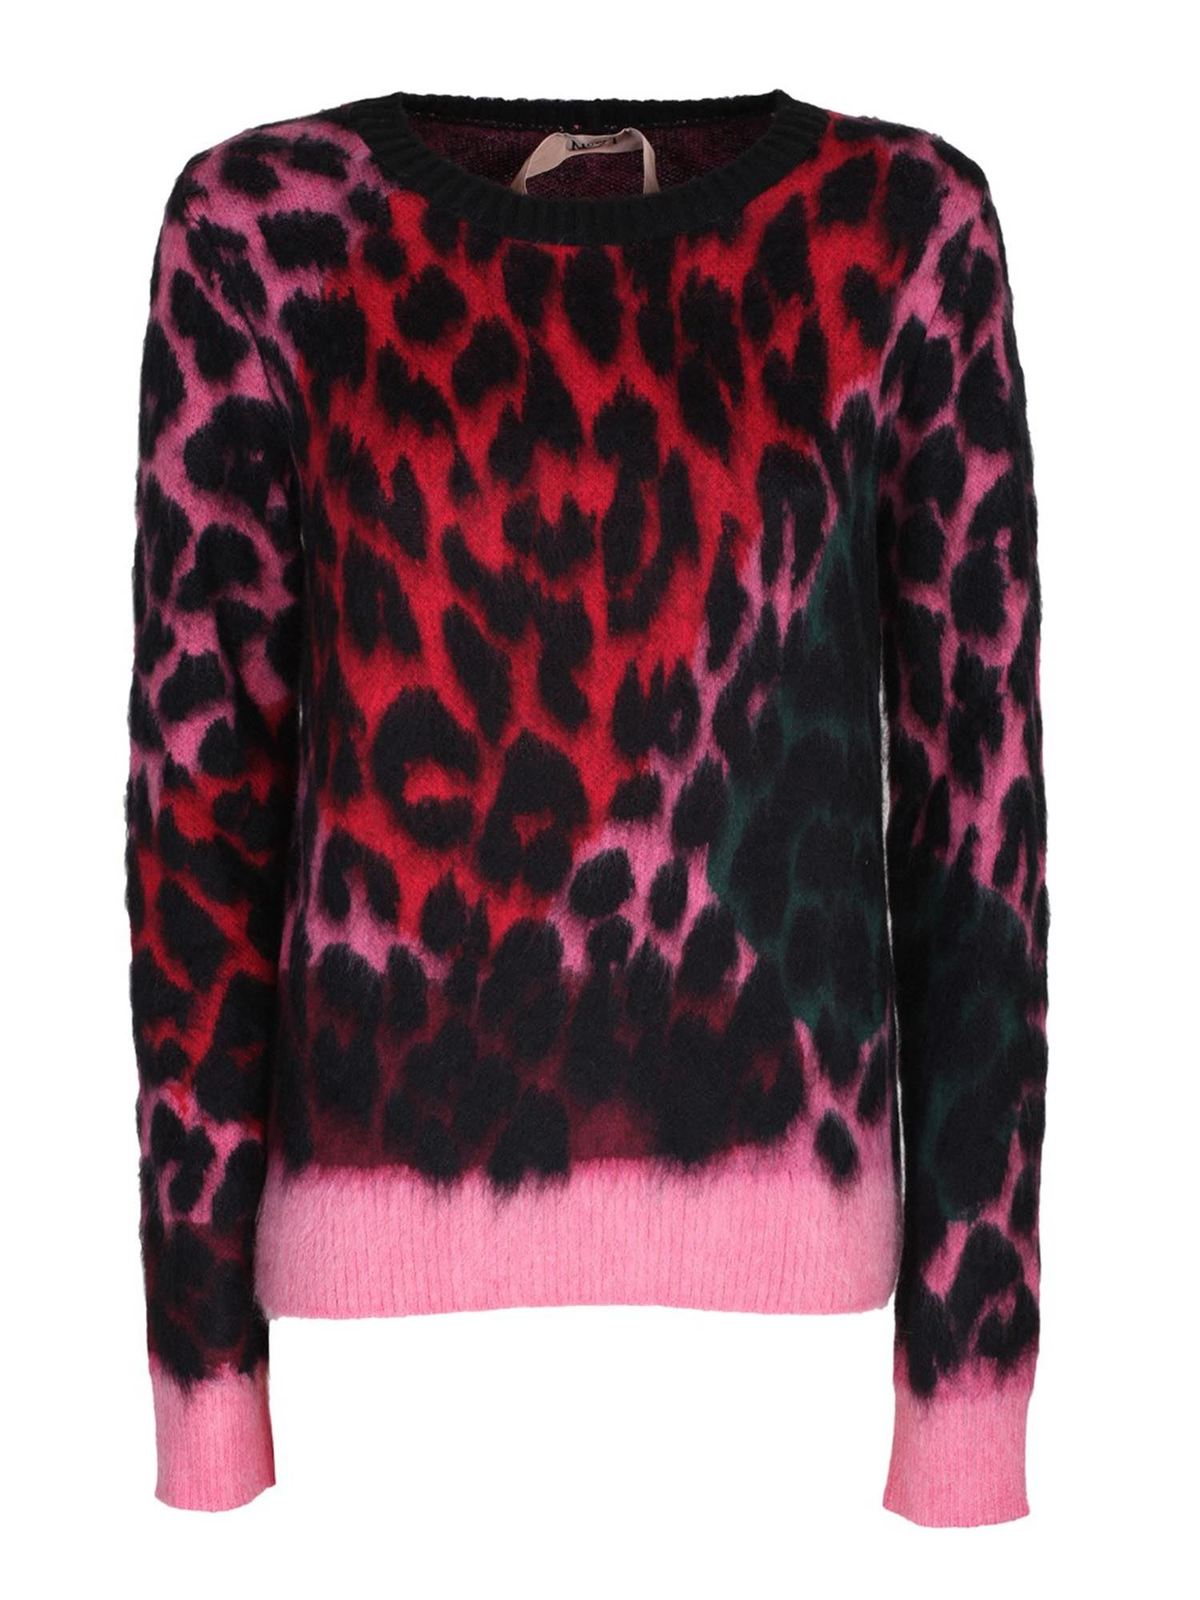 N°21 Sweaters ANIMALIER CREWNECK SWEATER